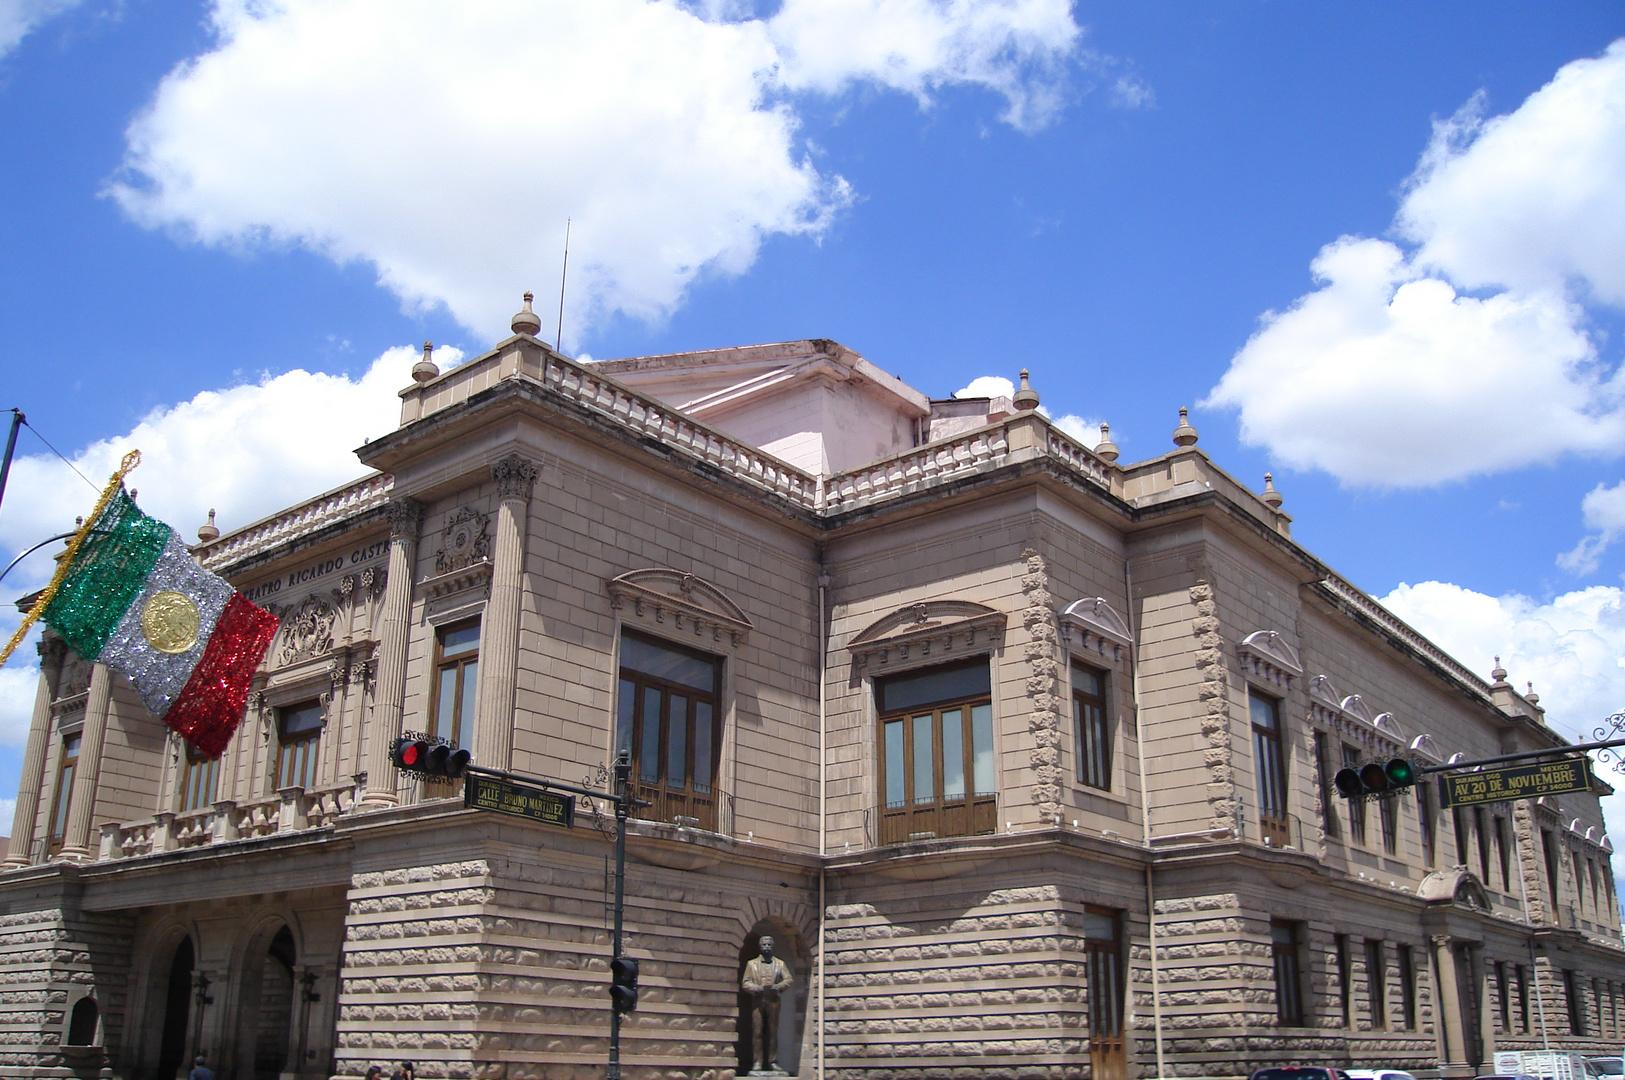 Teatro Ricardo Castro de Durango